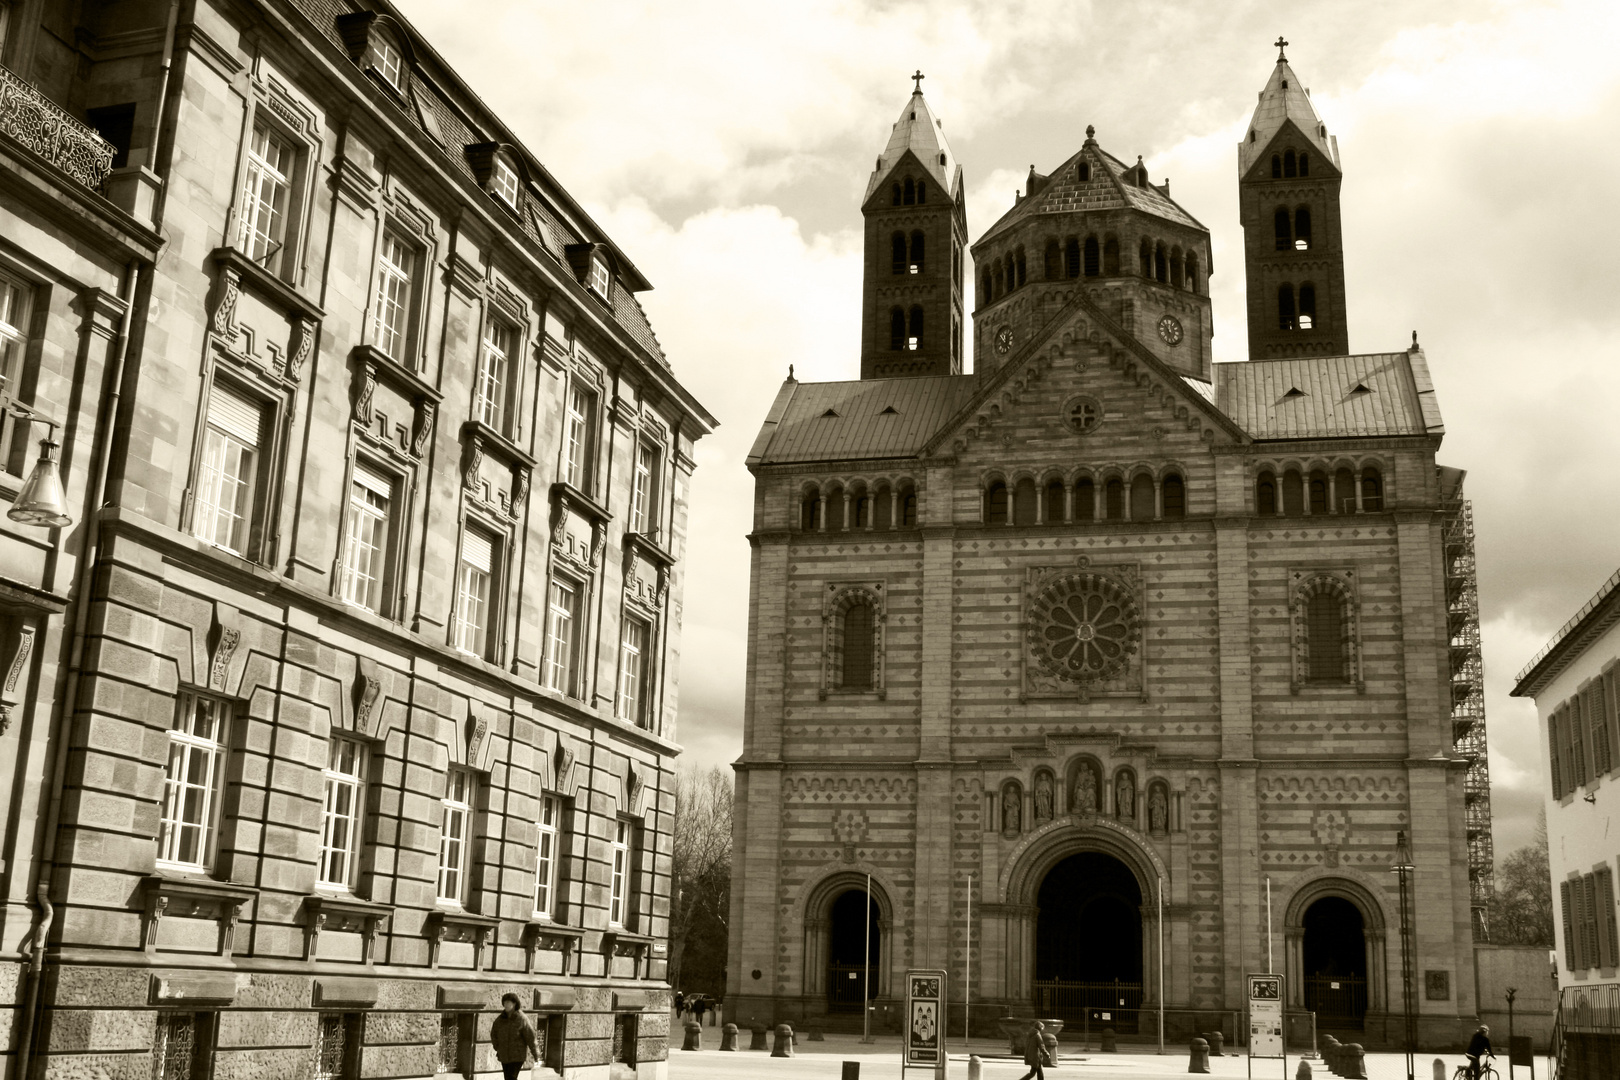 Dom zu Speyer...